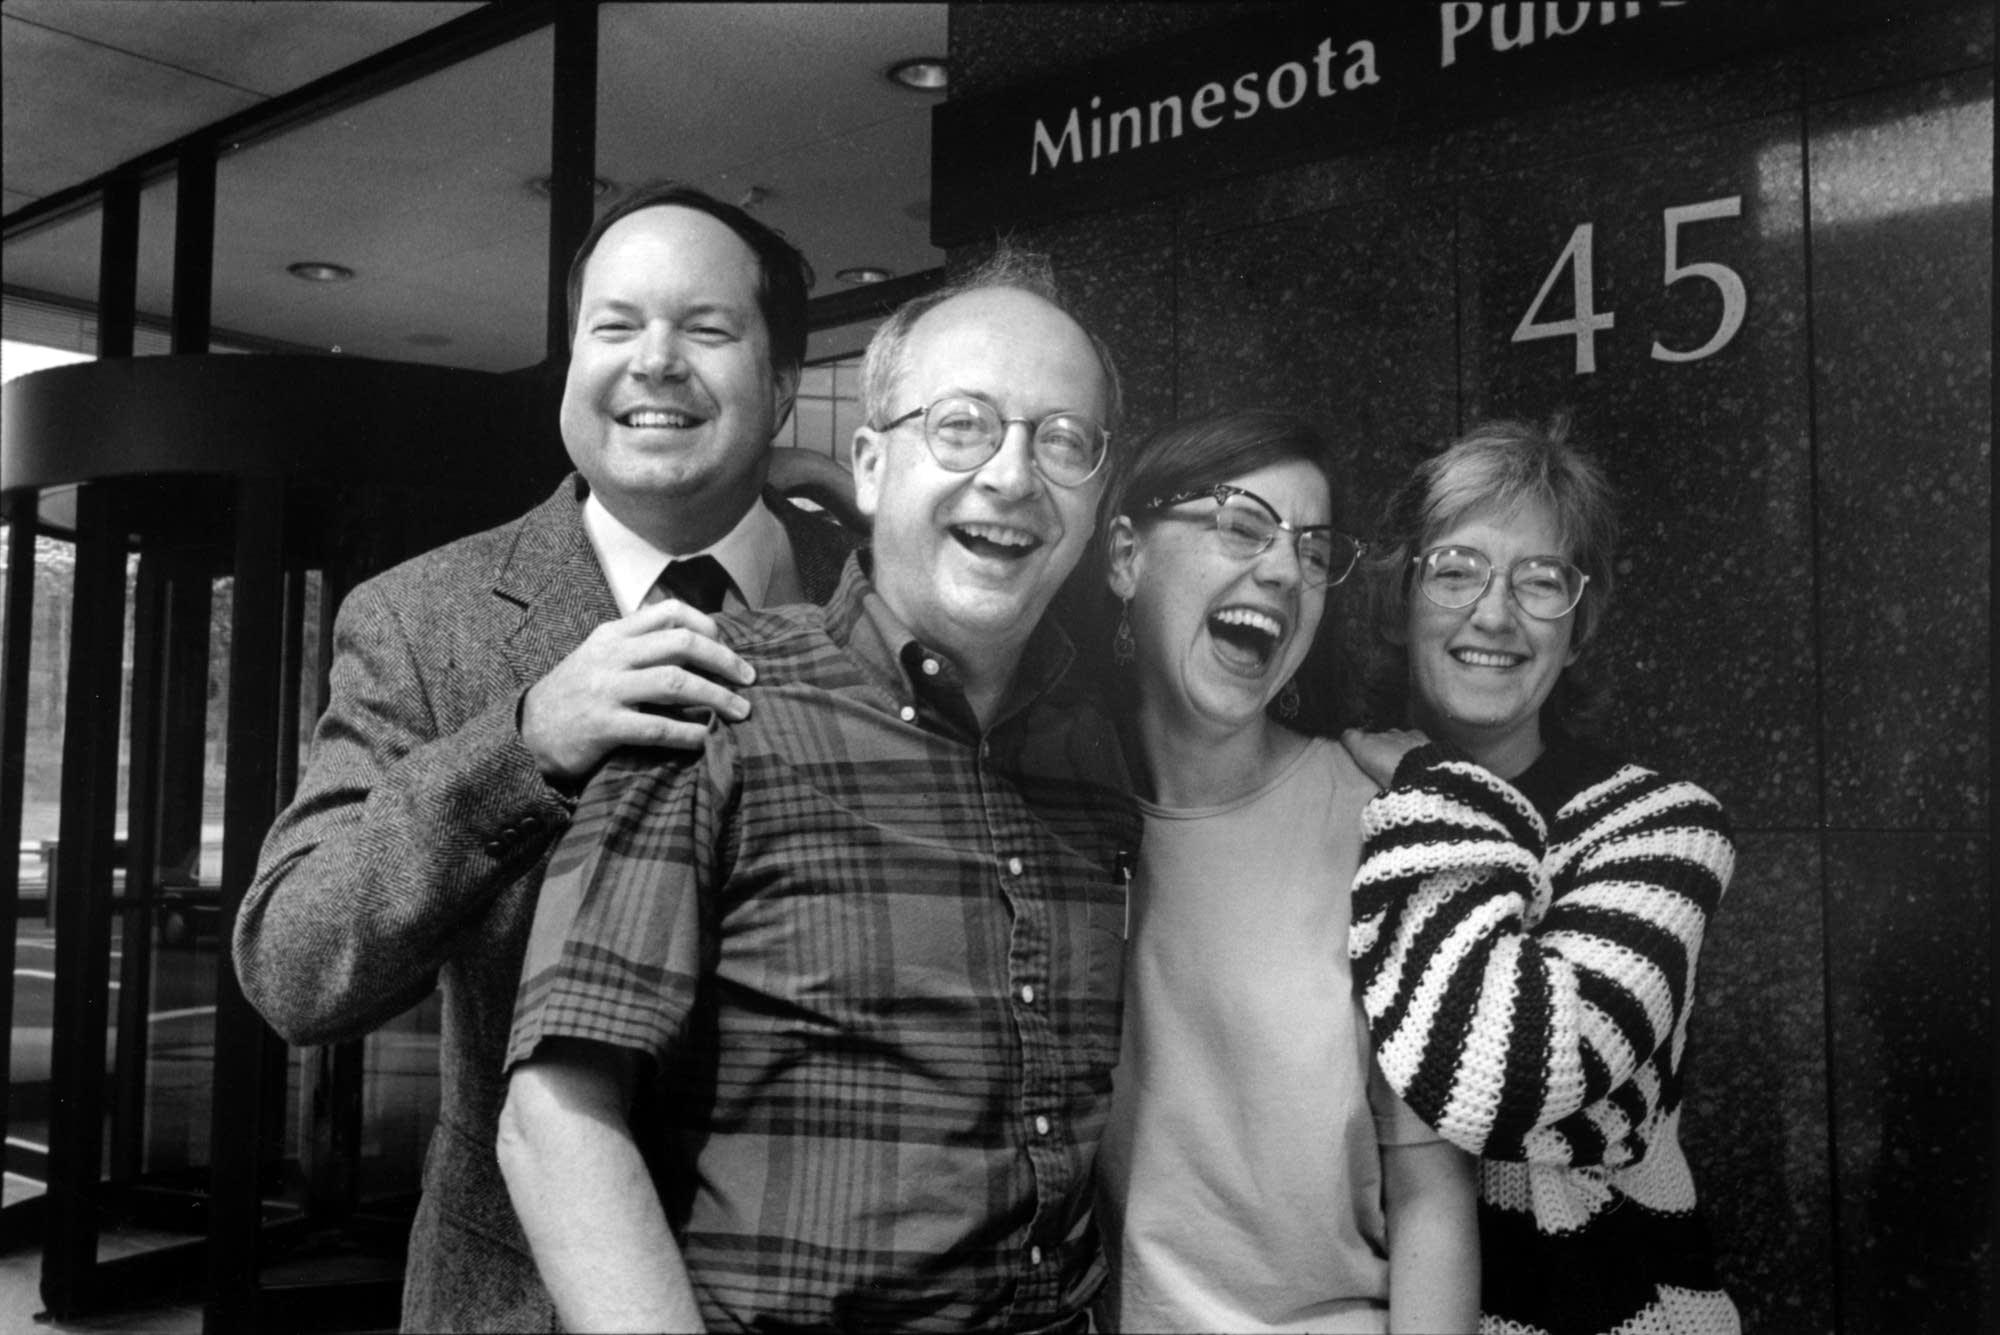 From left, Greg Magnuson, Bob Potter, Steph Curtis and Patti Rai Rudolf